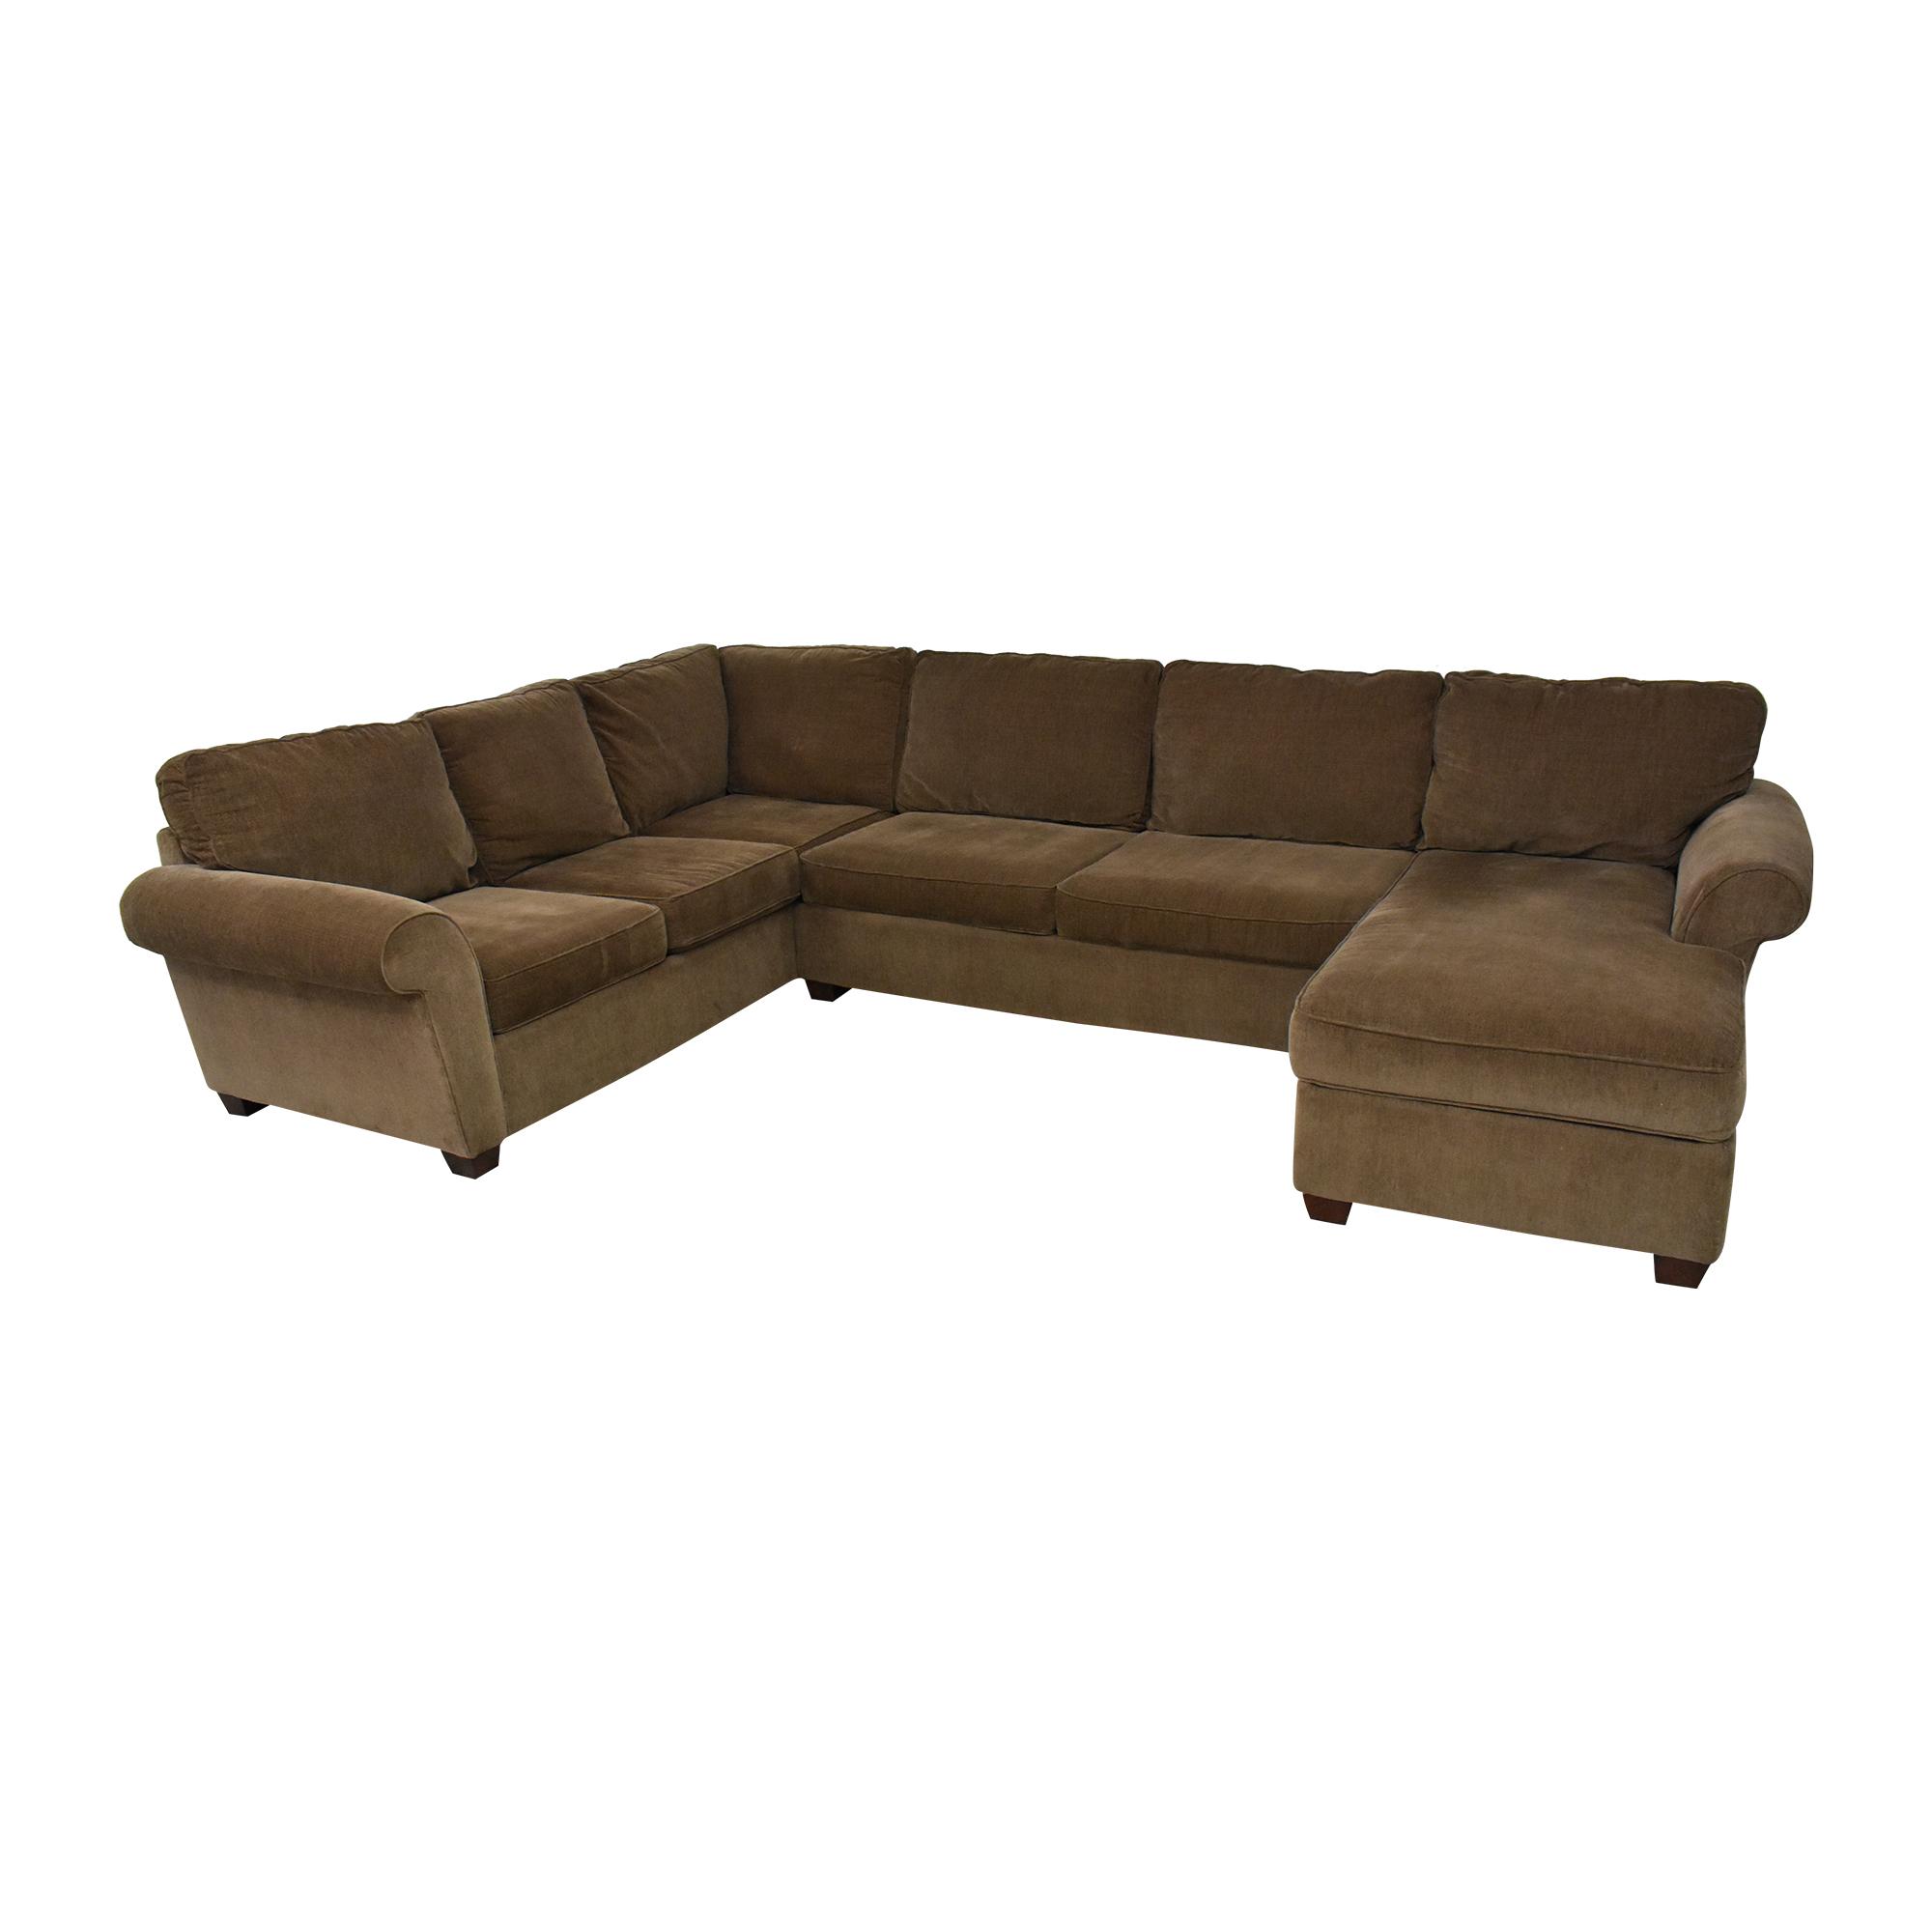 Raymour & Flanigan Raymour & Flanigan Sectional Sofa with Chaise nj